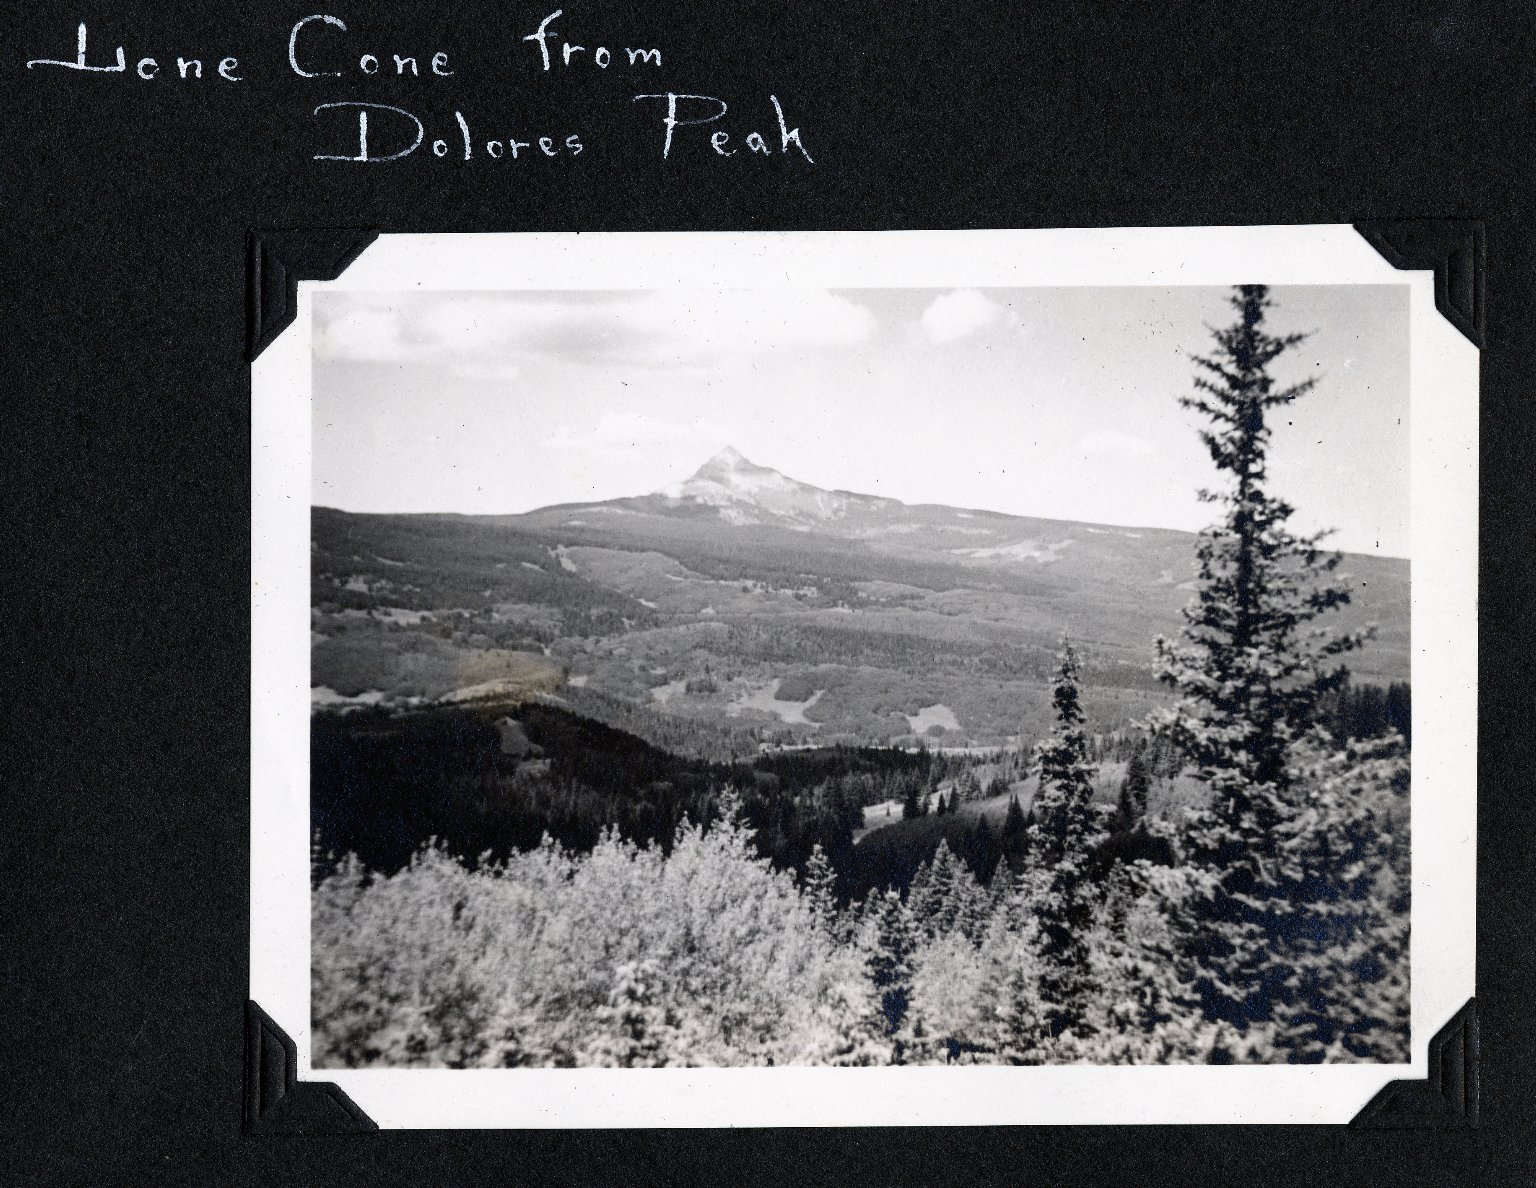 Lone Cone from Dolores Peak, 2